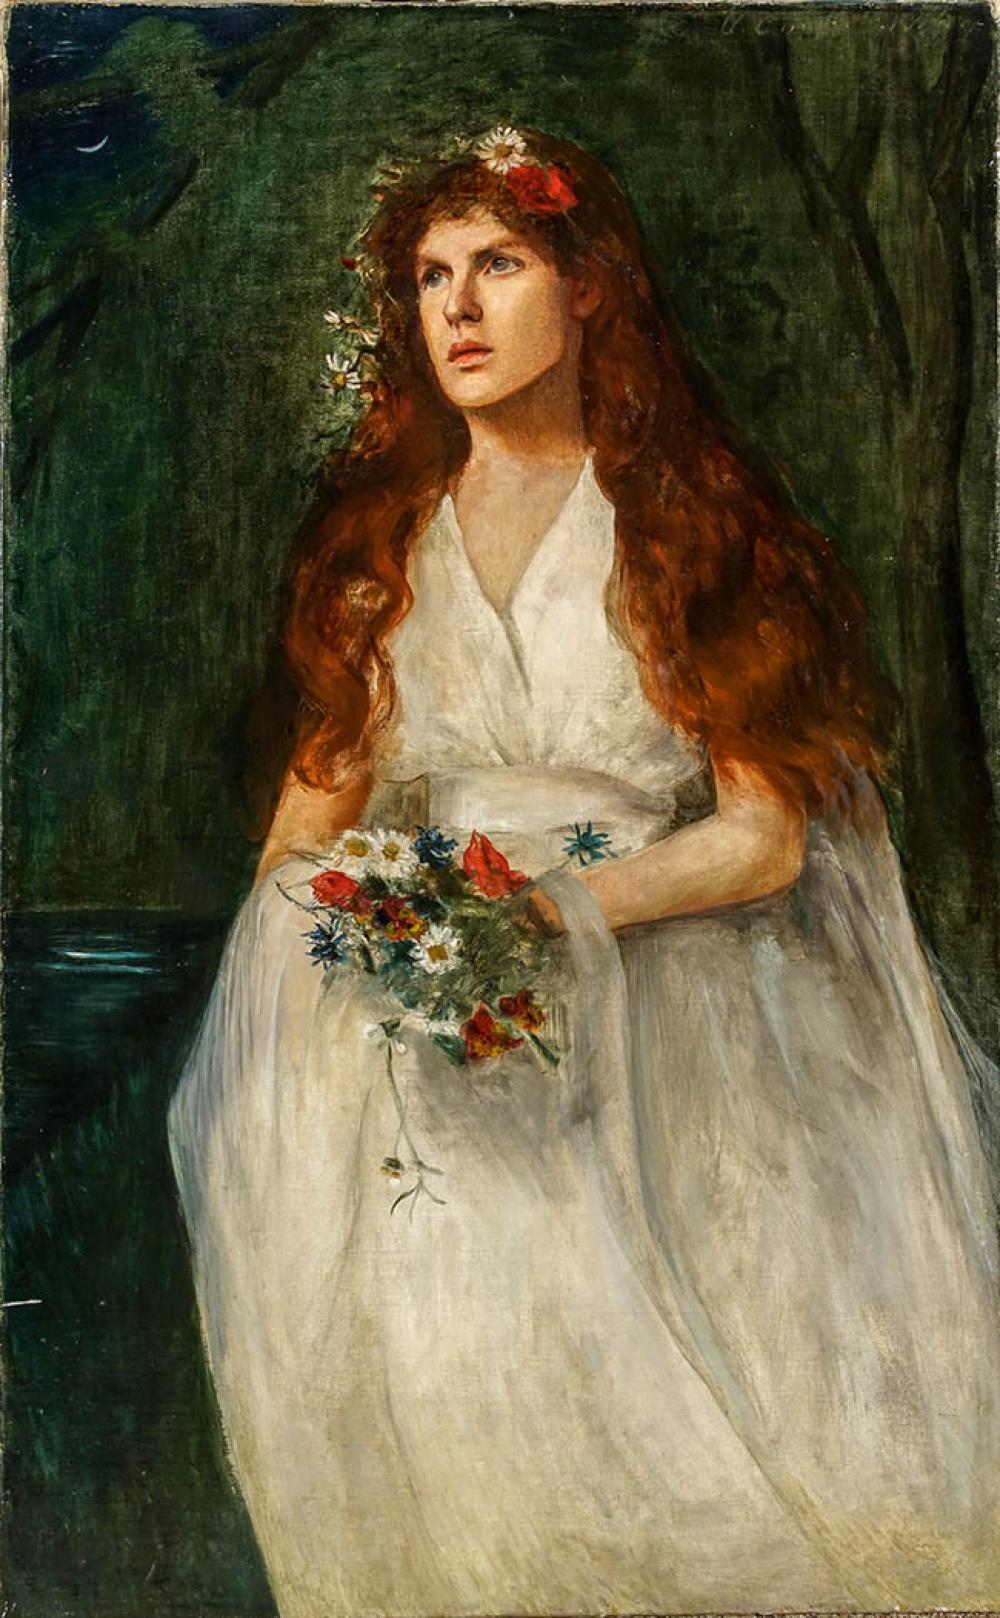 British School, 19th Century, Pre-Raphaelite Bride, Oil on Canvas, 51-1/4 x 32 in